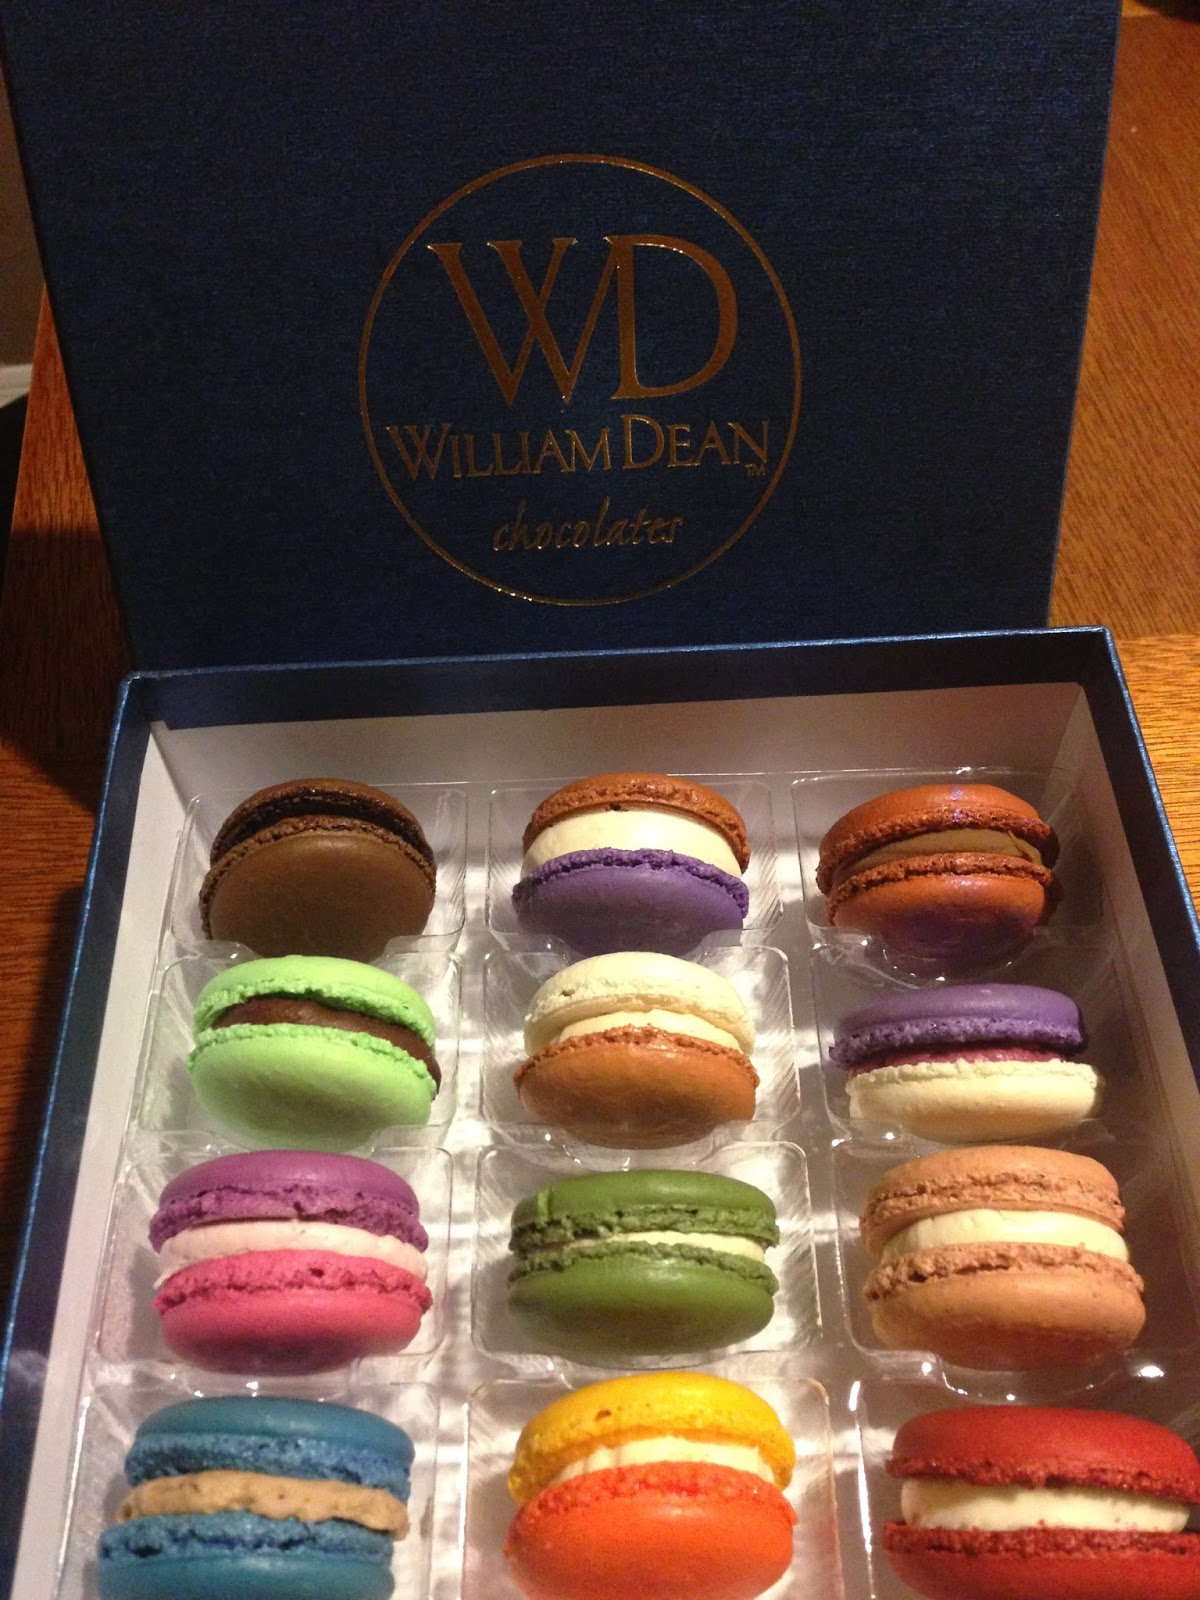 I Run For Wine: William Dean Events - Macaron Class